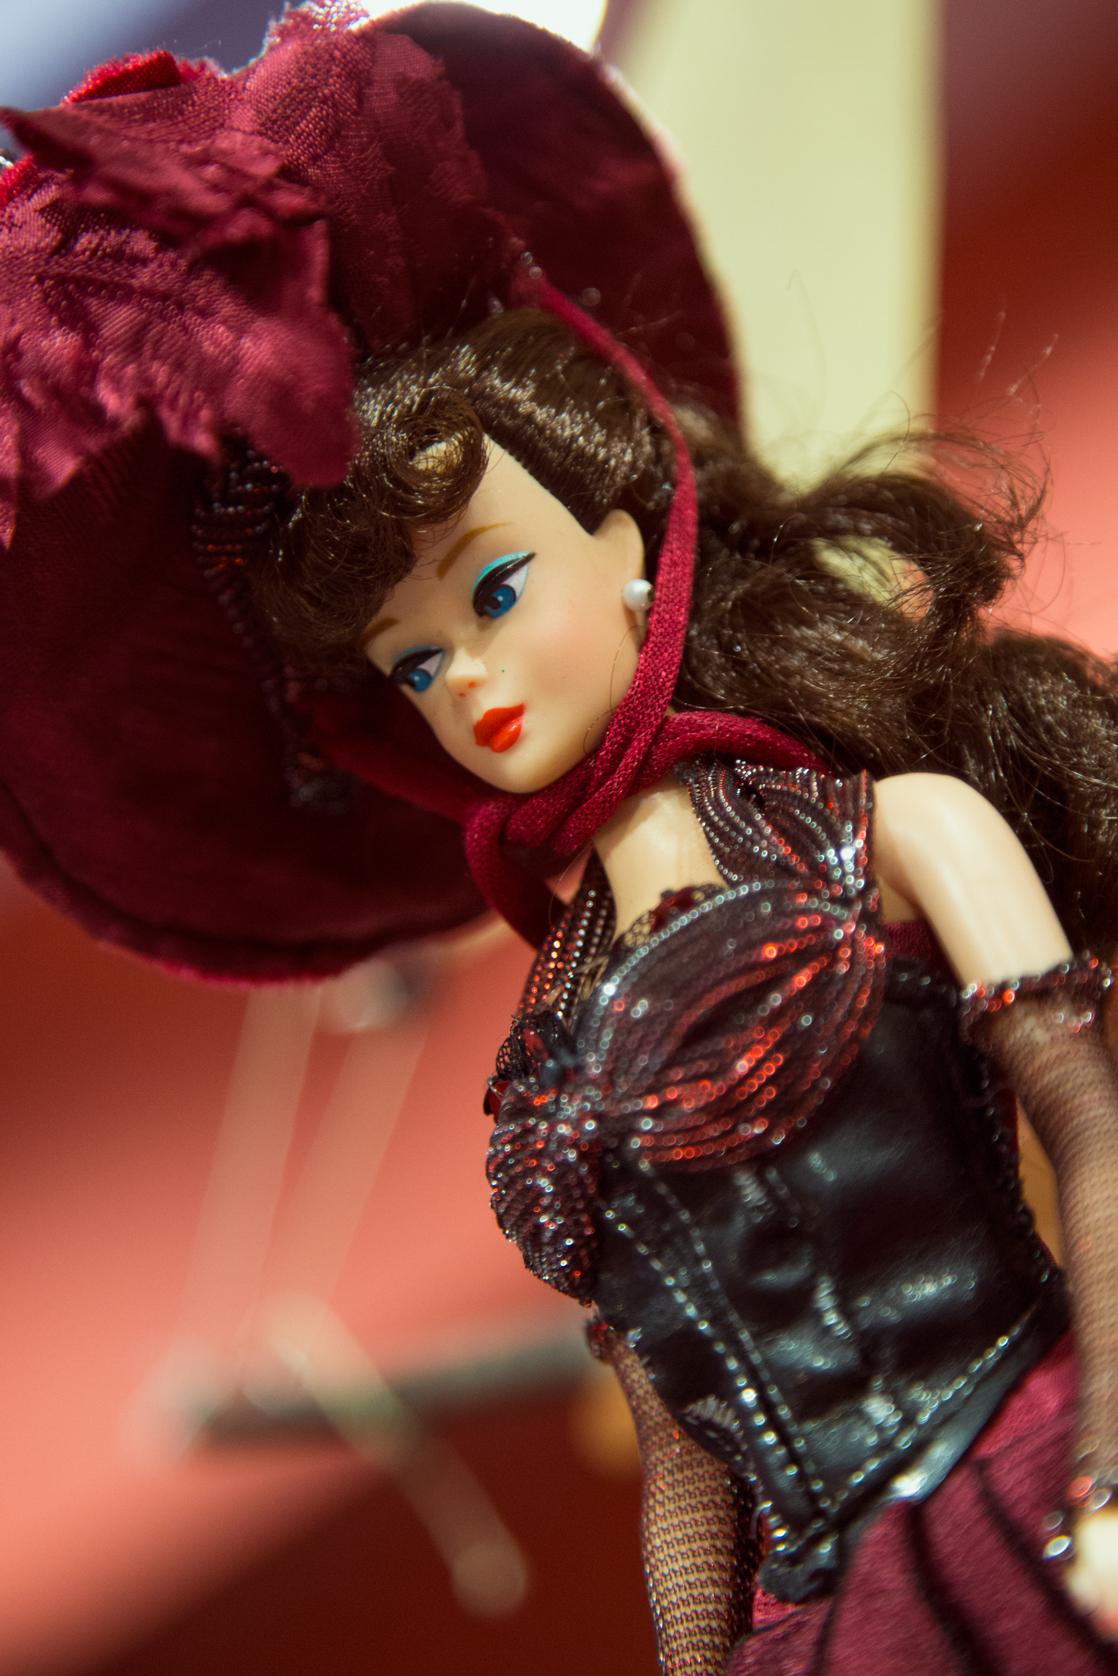 Barbie Reproduction μεχειροποίητο ιταλικό φόρεμα